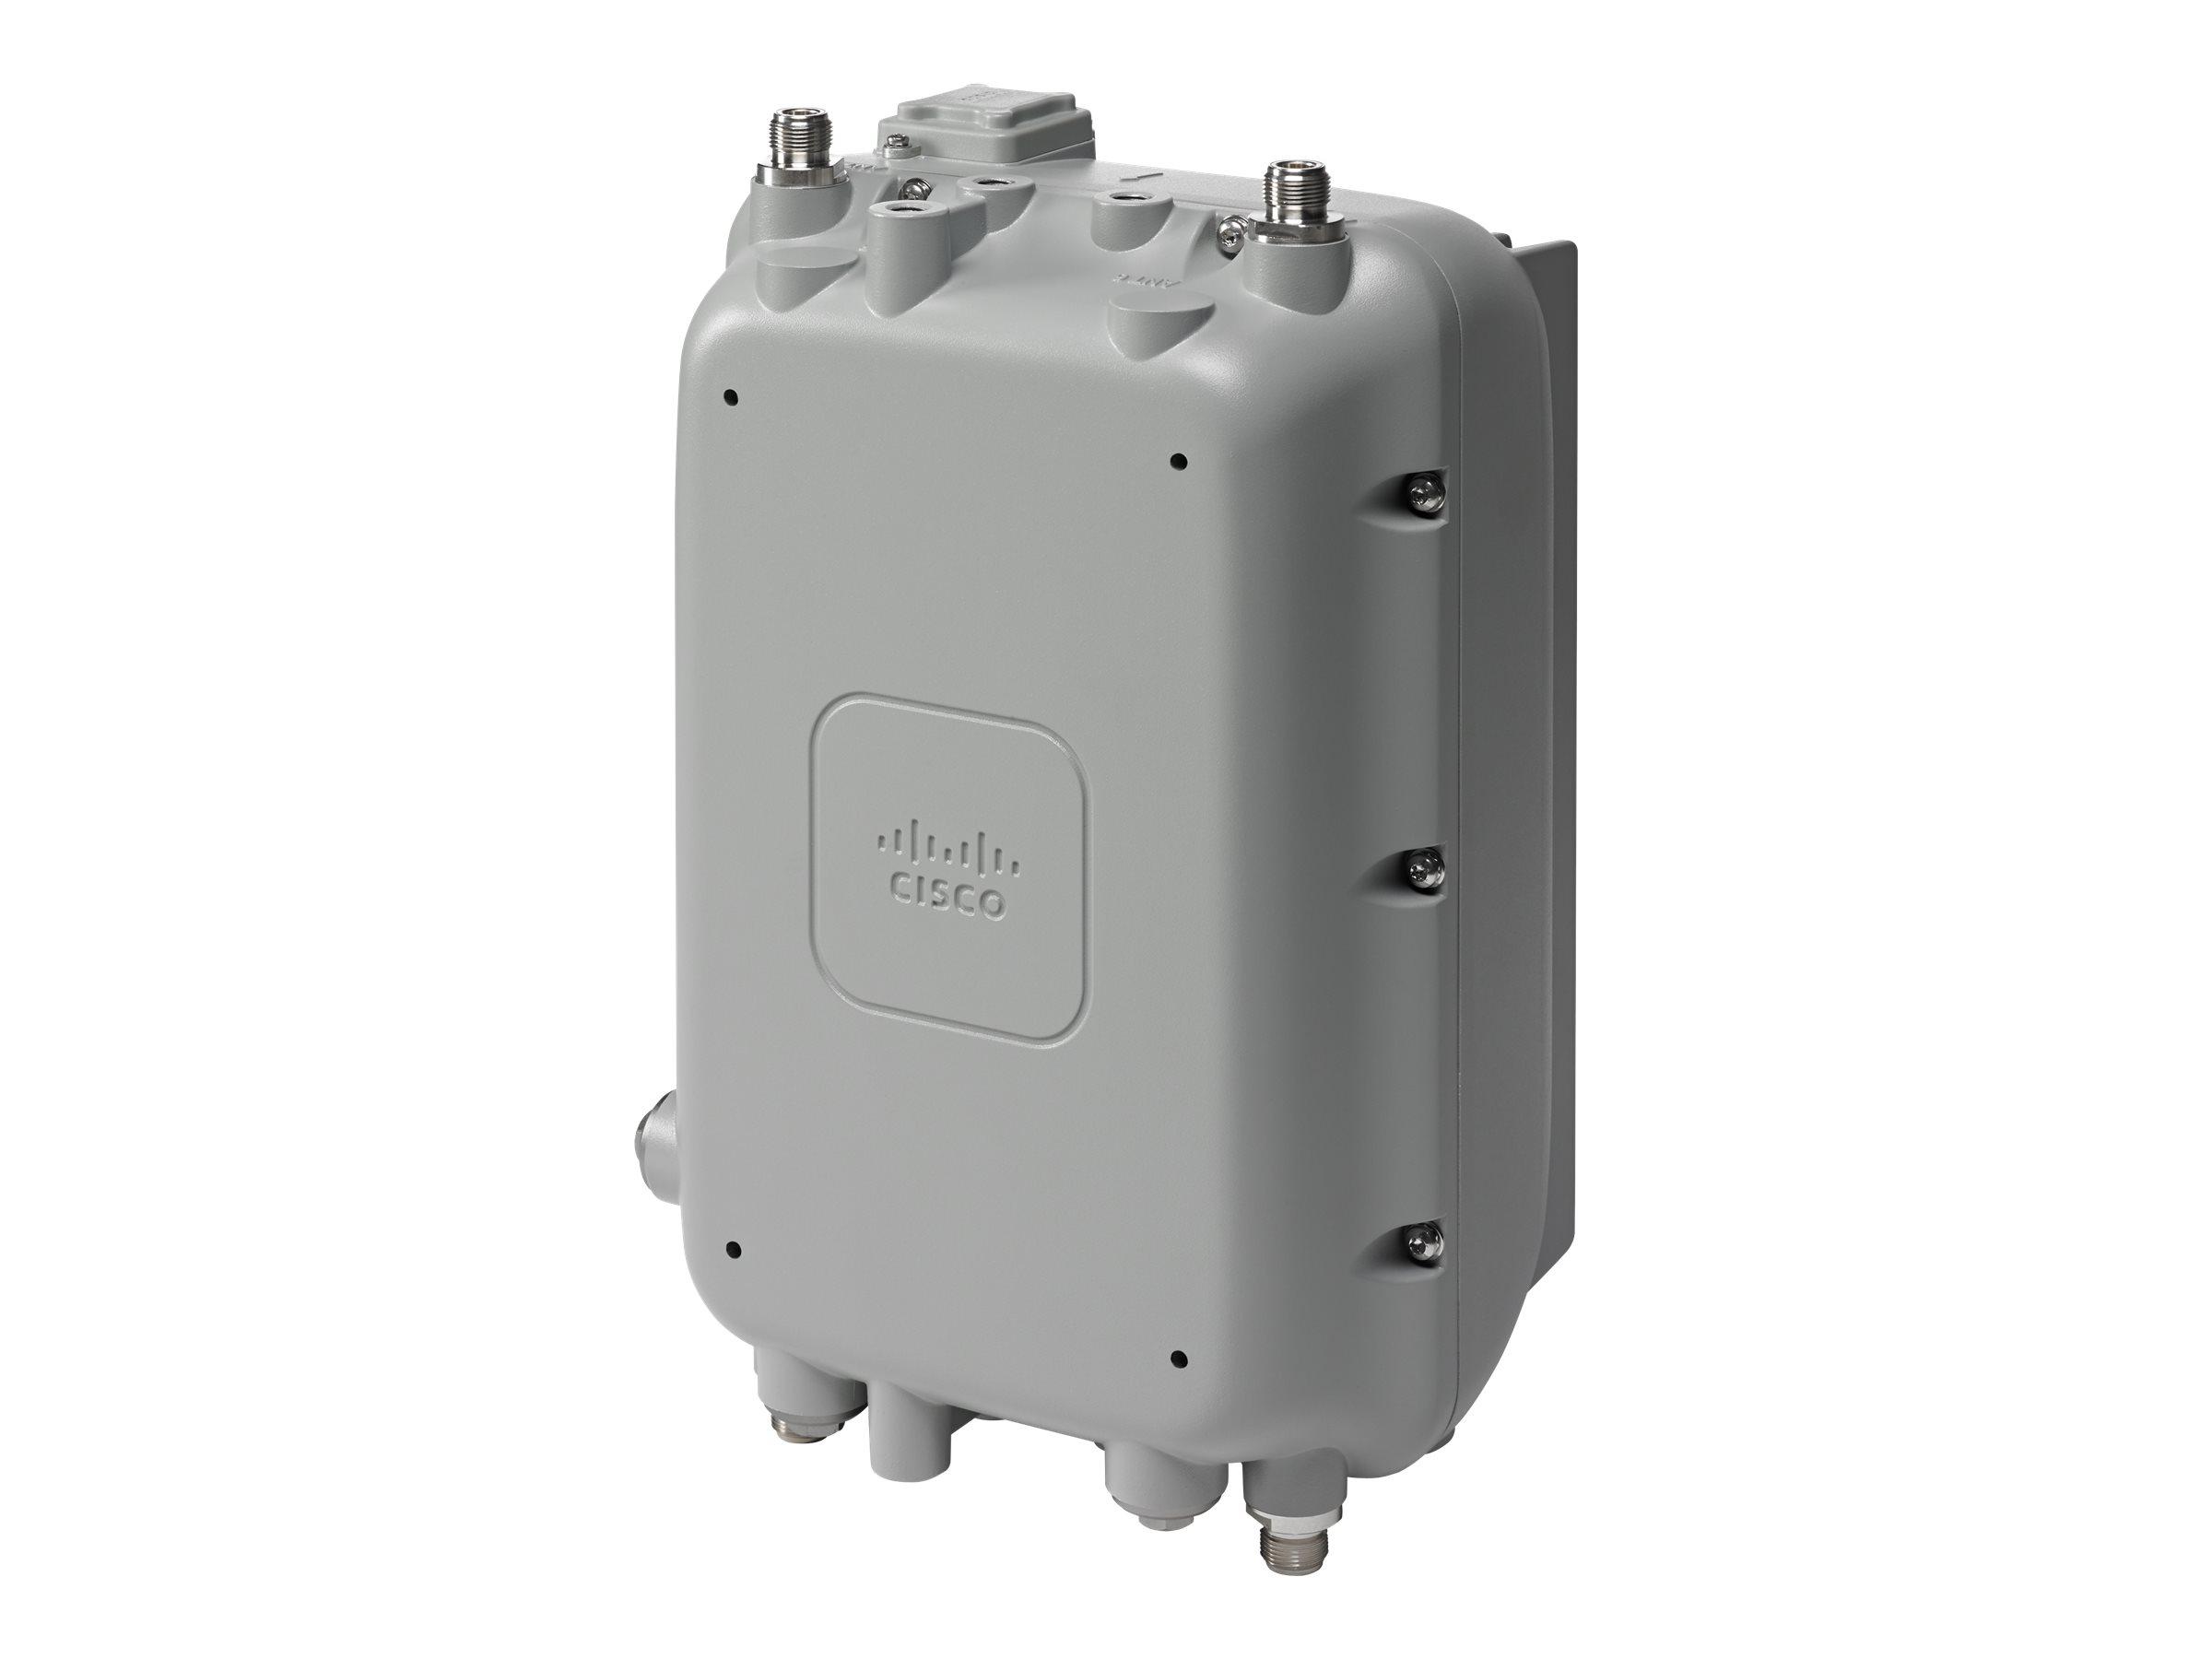 Cisco Aironet 1572EAC - Funkbasisstation - Wi-Fi - 2.4 GHz, 5 GHz - AC 120/230 V/DC 10 - 16 V